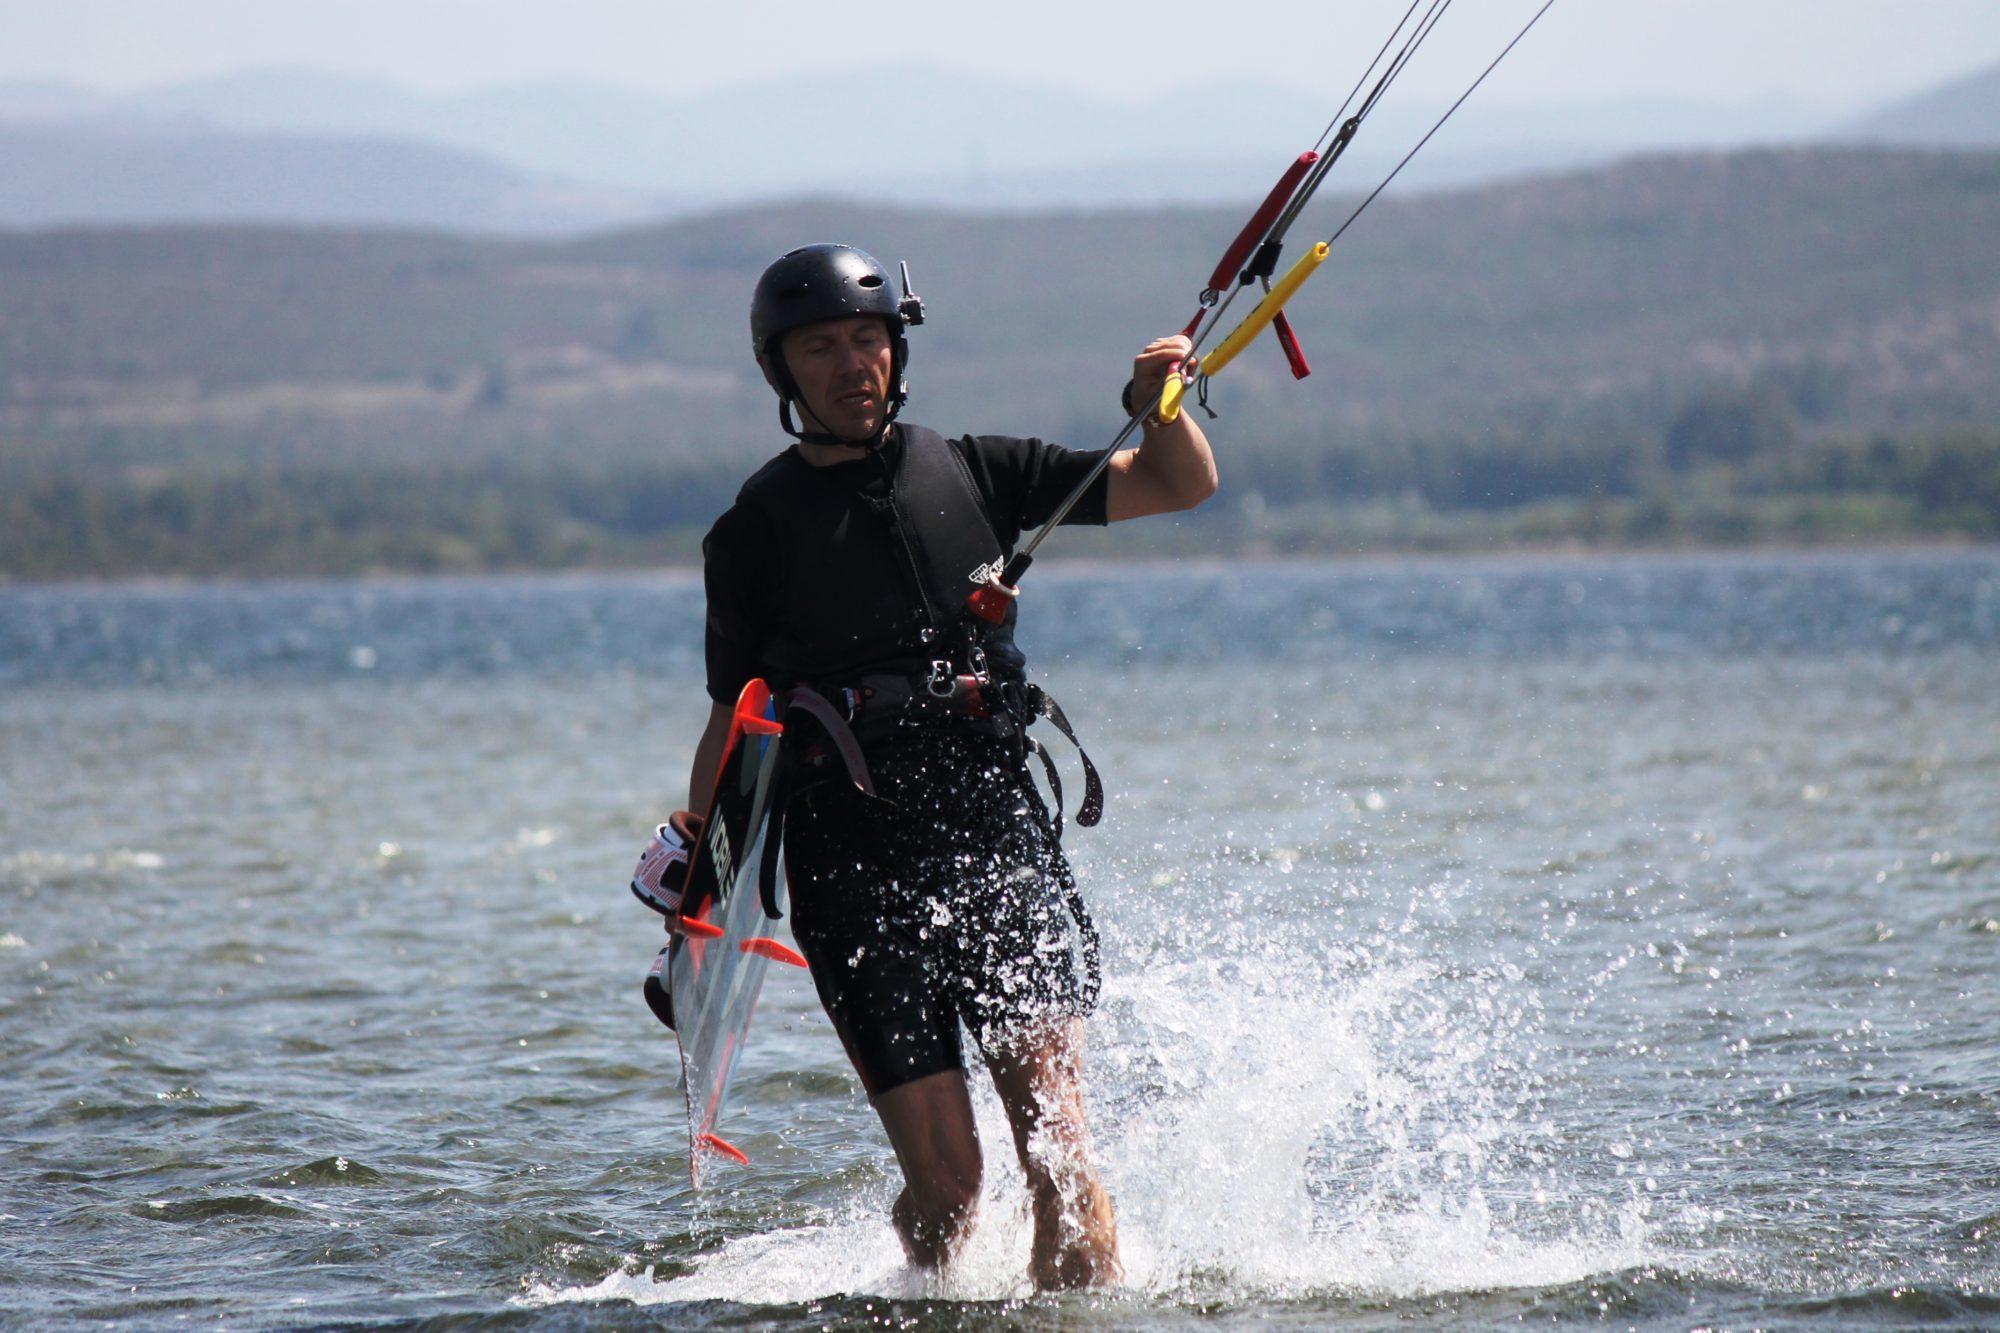 Learn Kitesurfing in Punta Trettu Sardinia